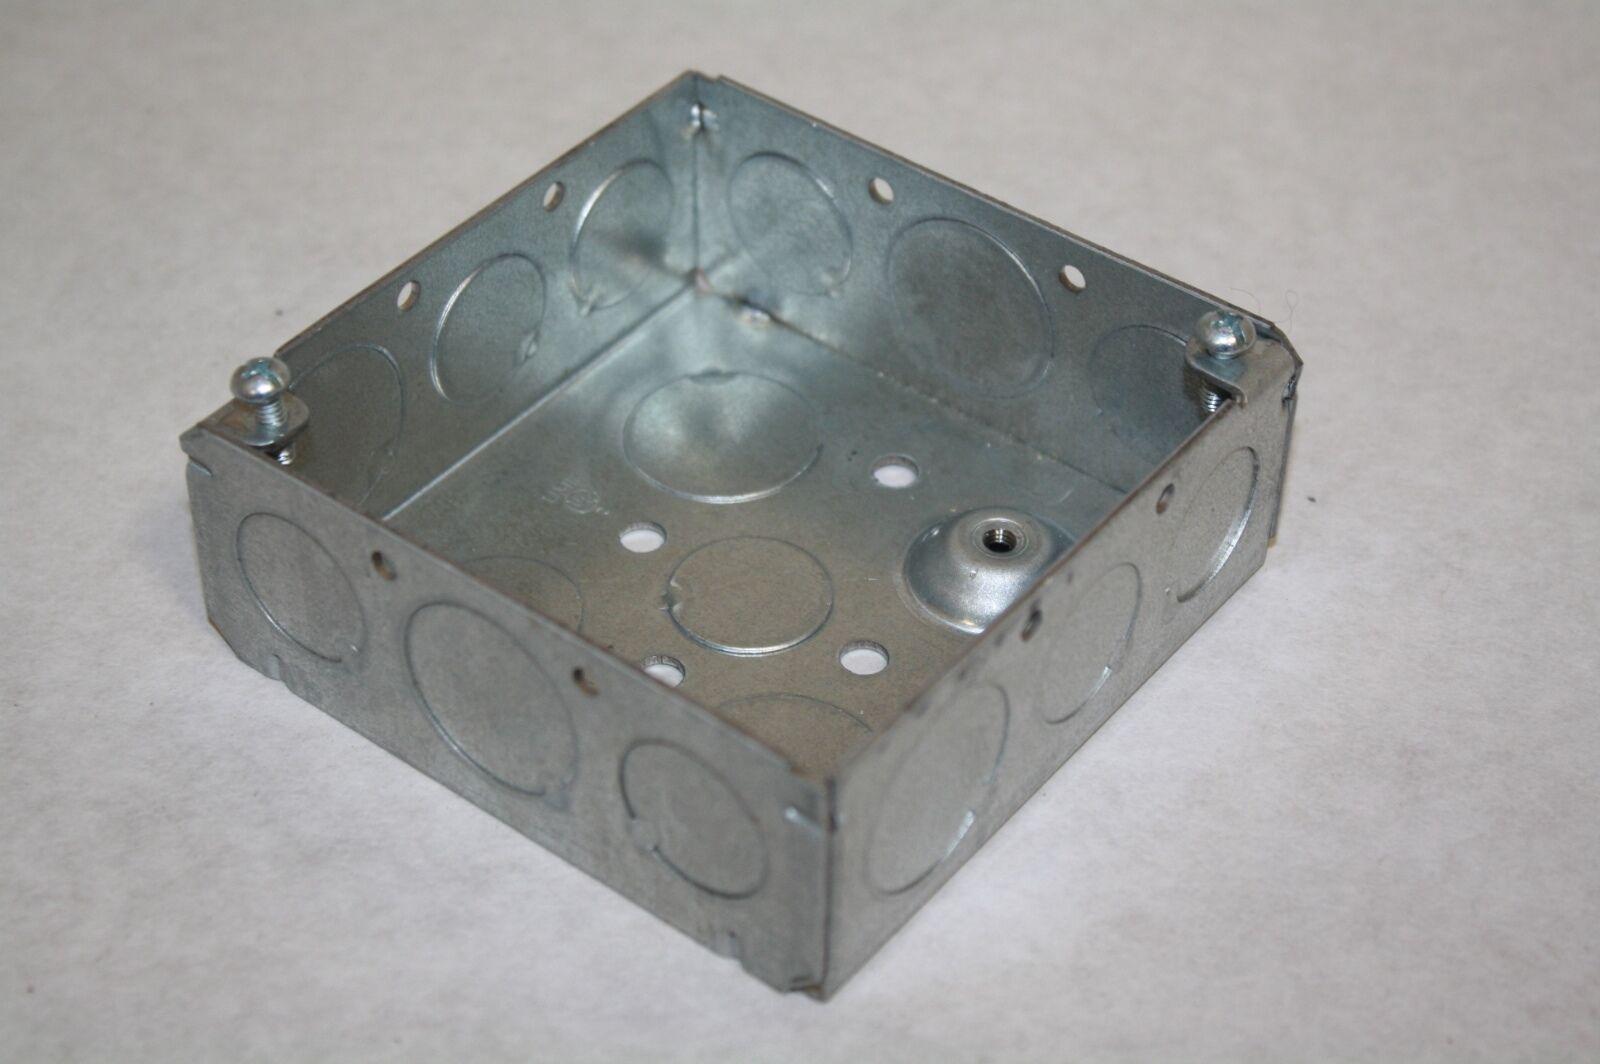 (18 )ORBIT 4SB-50 75 4  x 1 1 2  SQUARE WELDED BOX